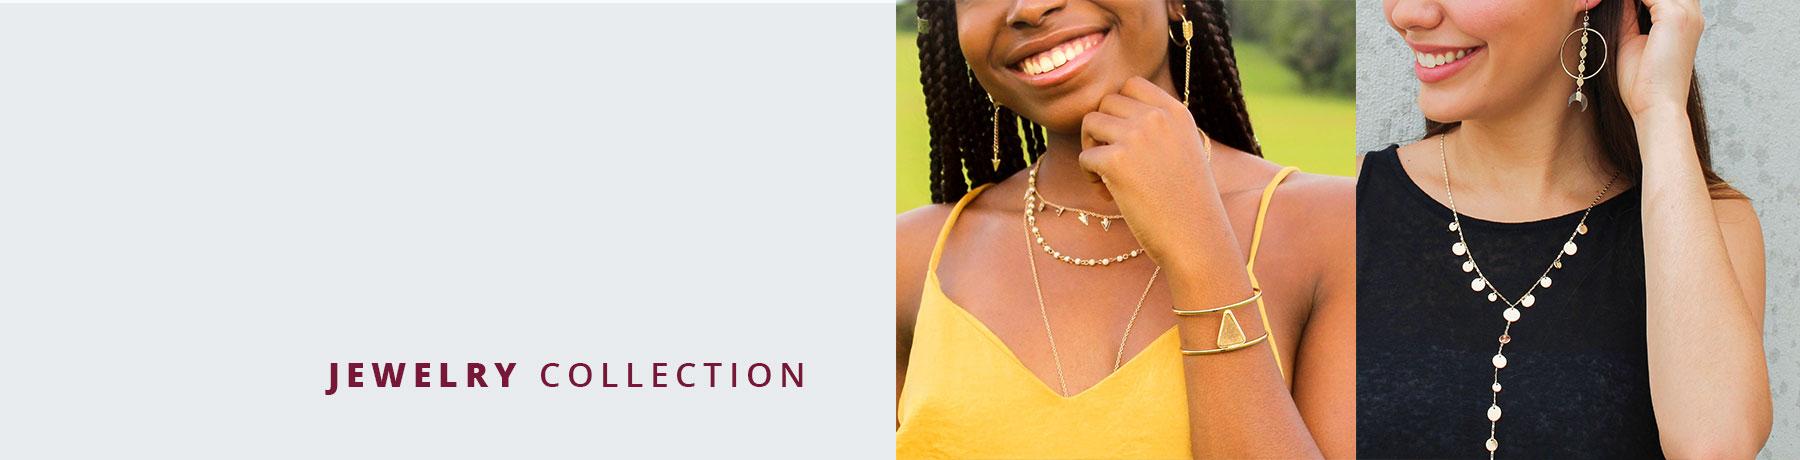 Women's Boutique Jewelry